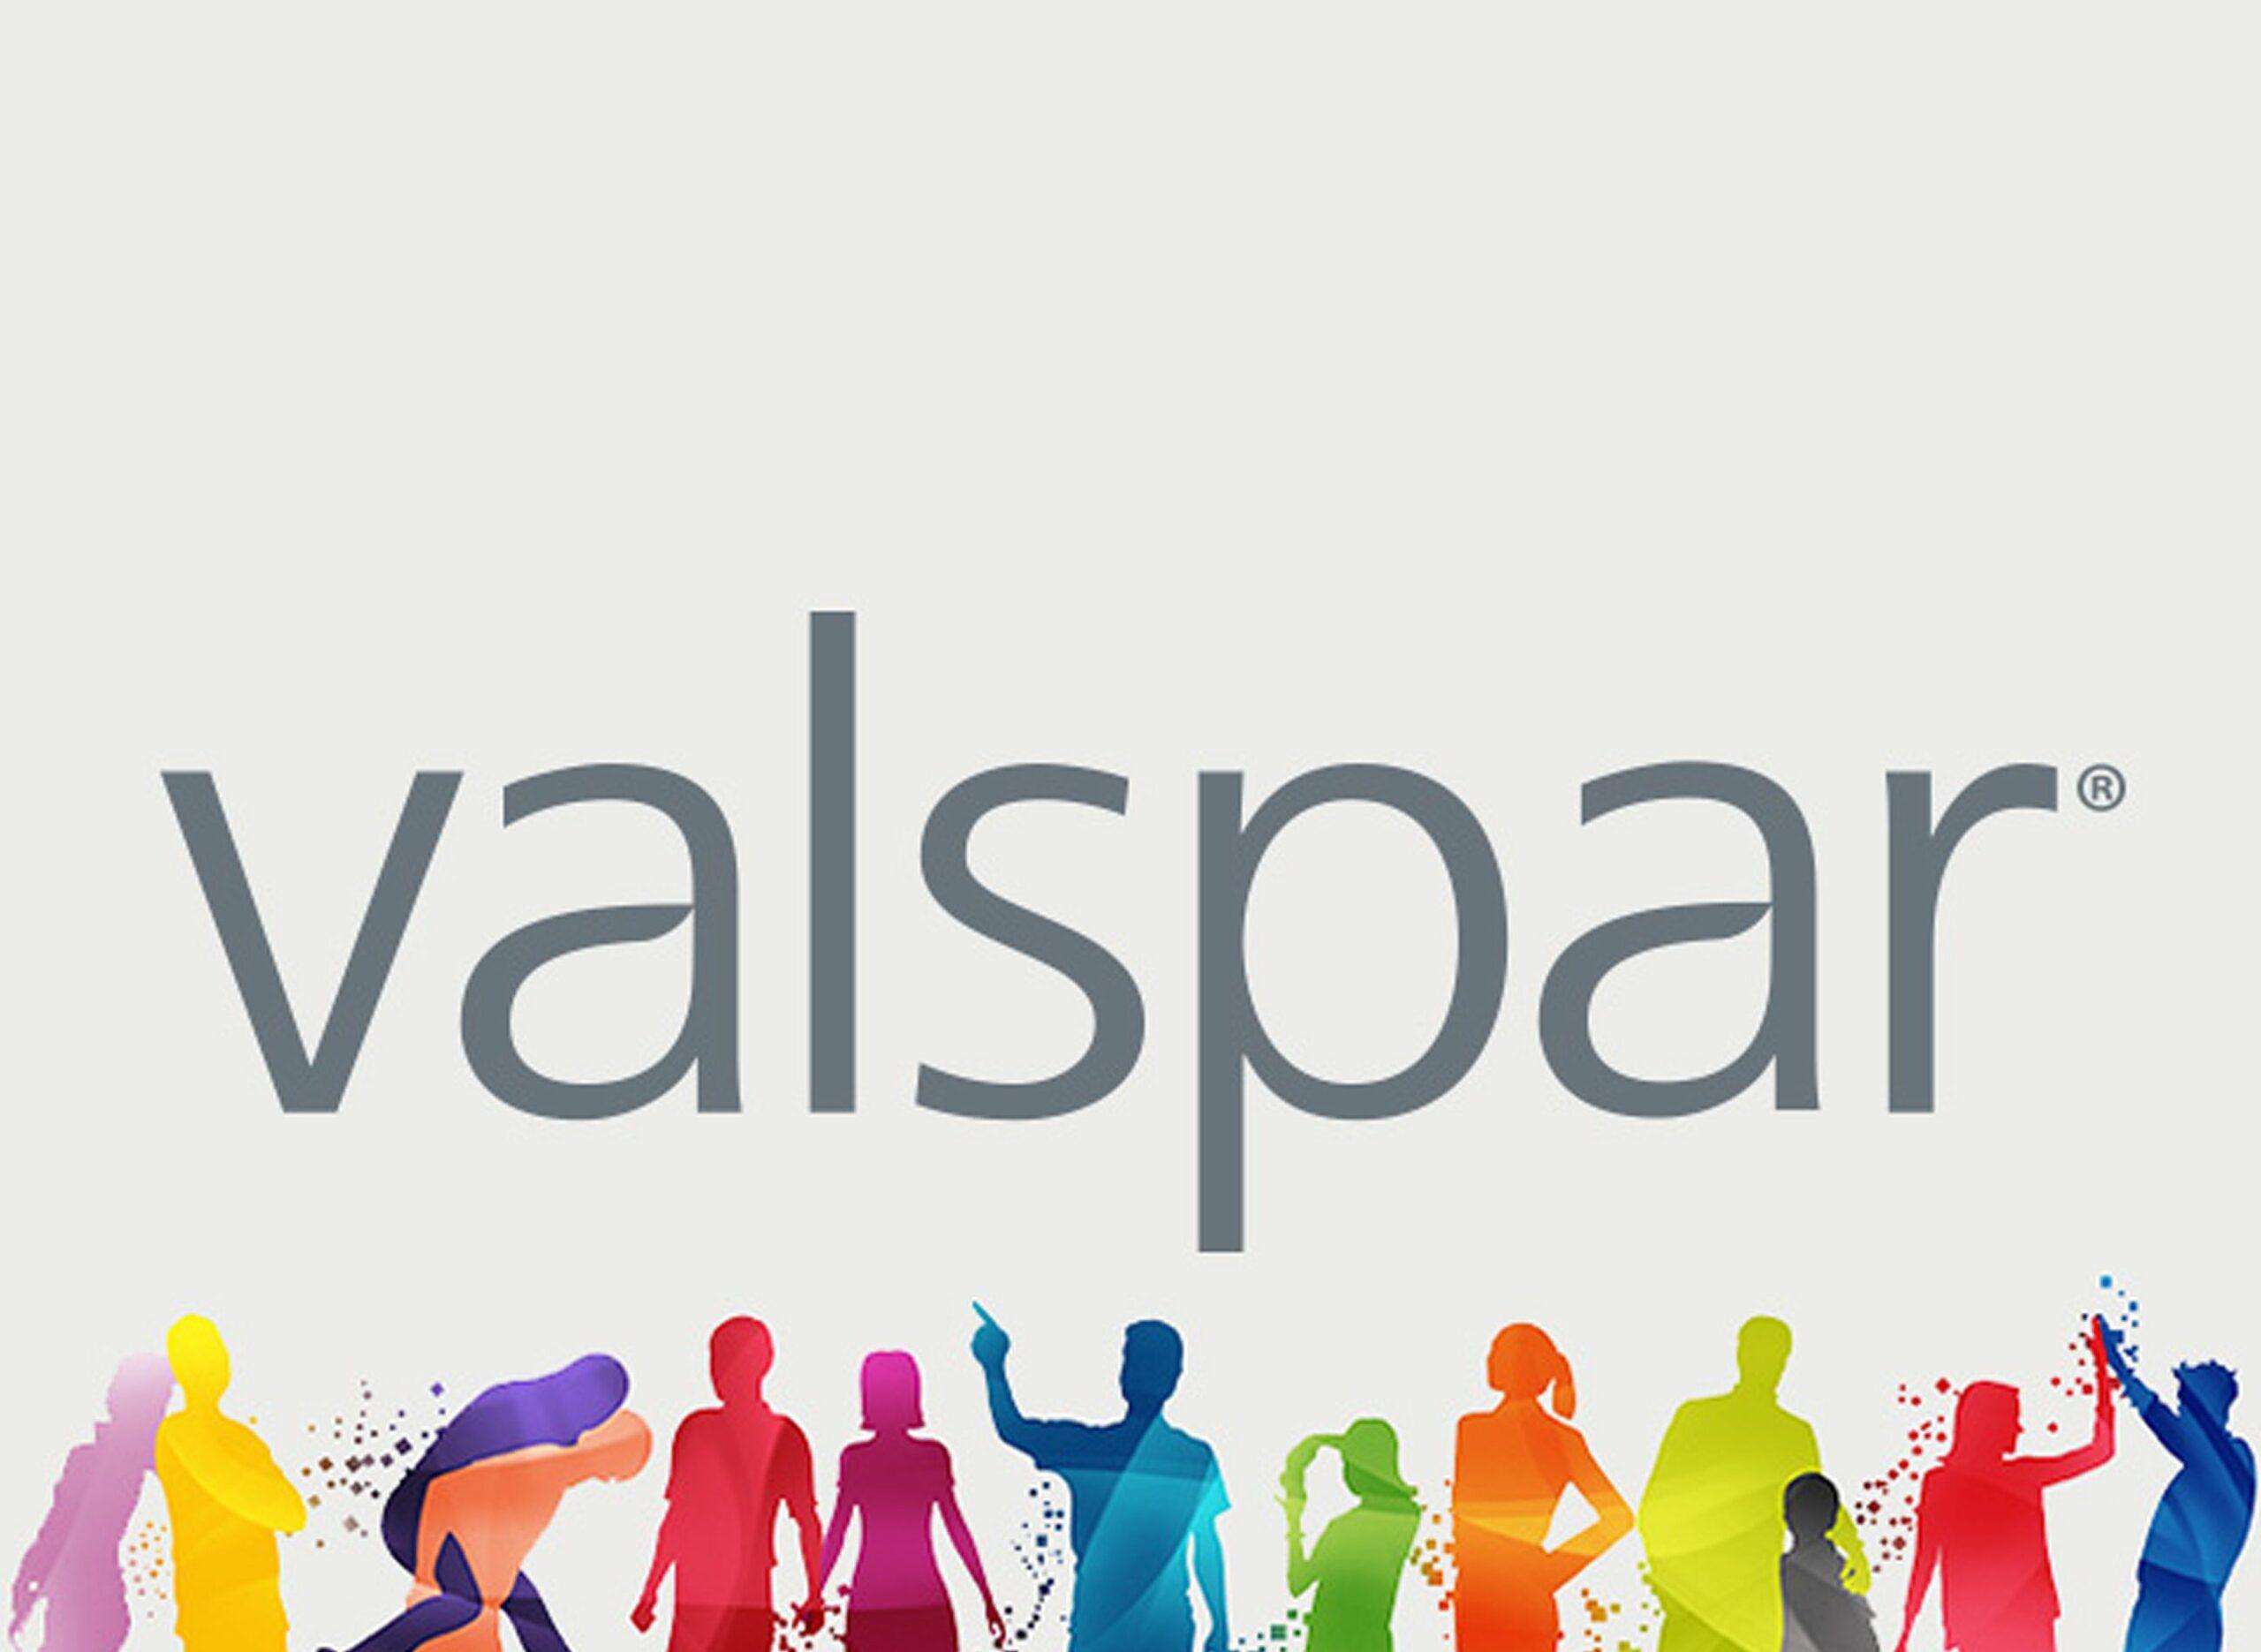 Valspar Paint Brings Color To the Colorblind [Video]